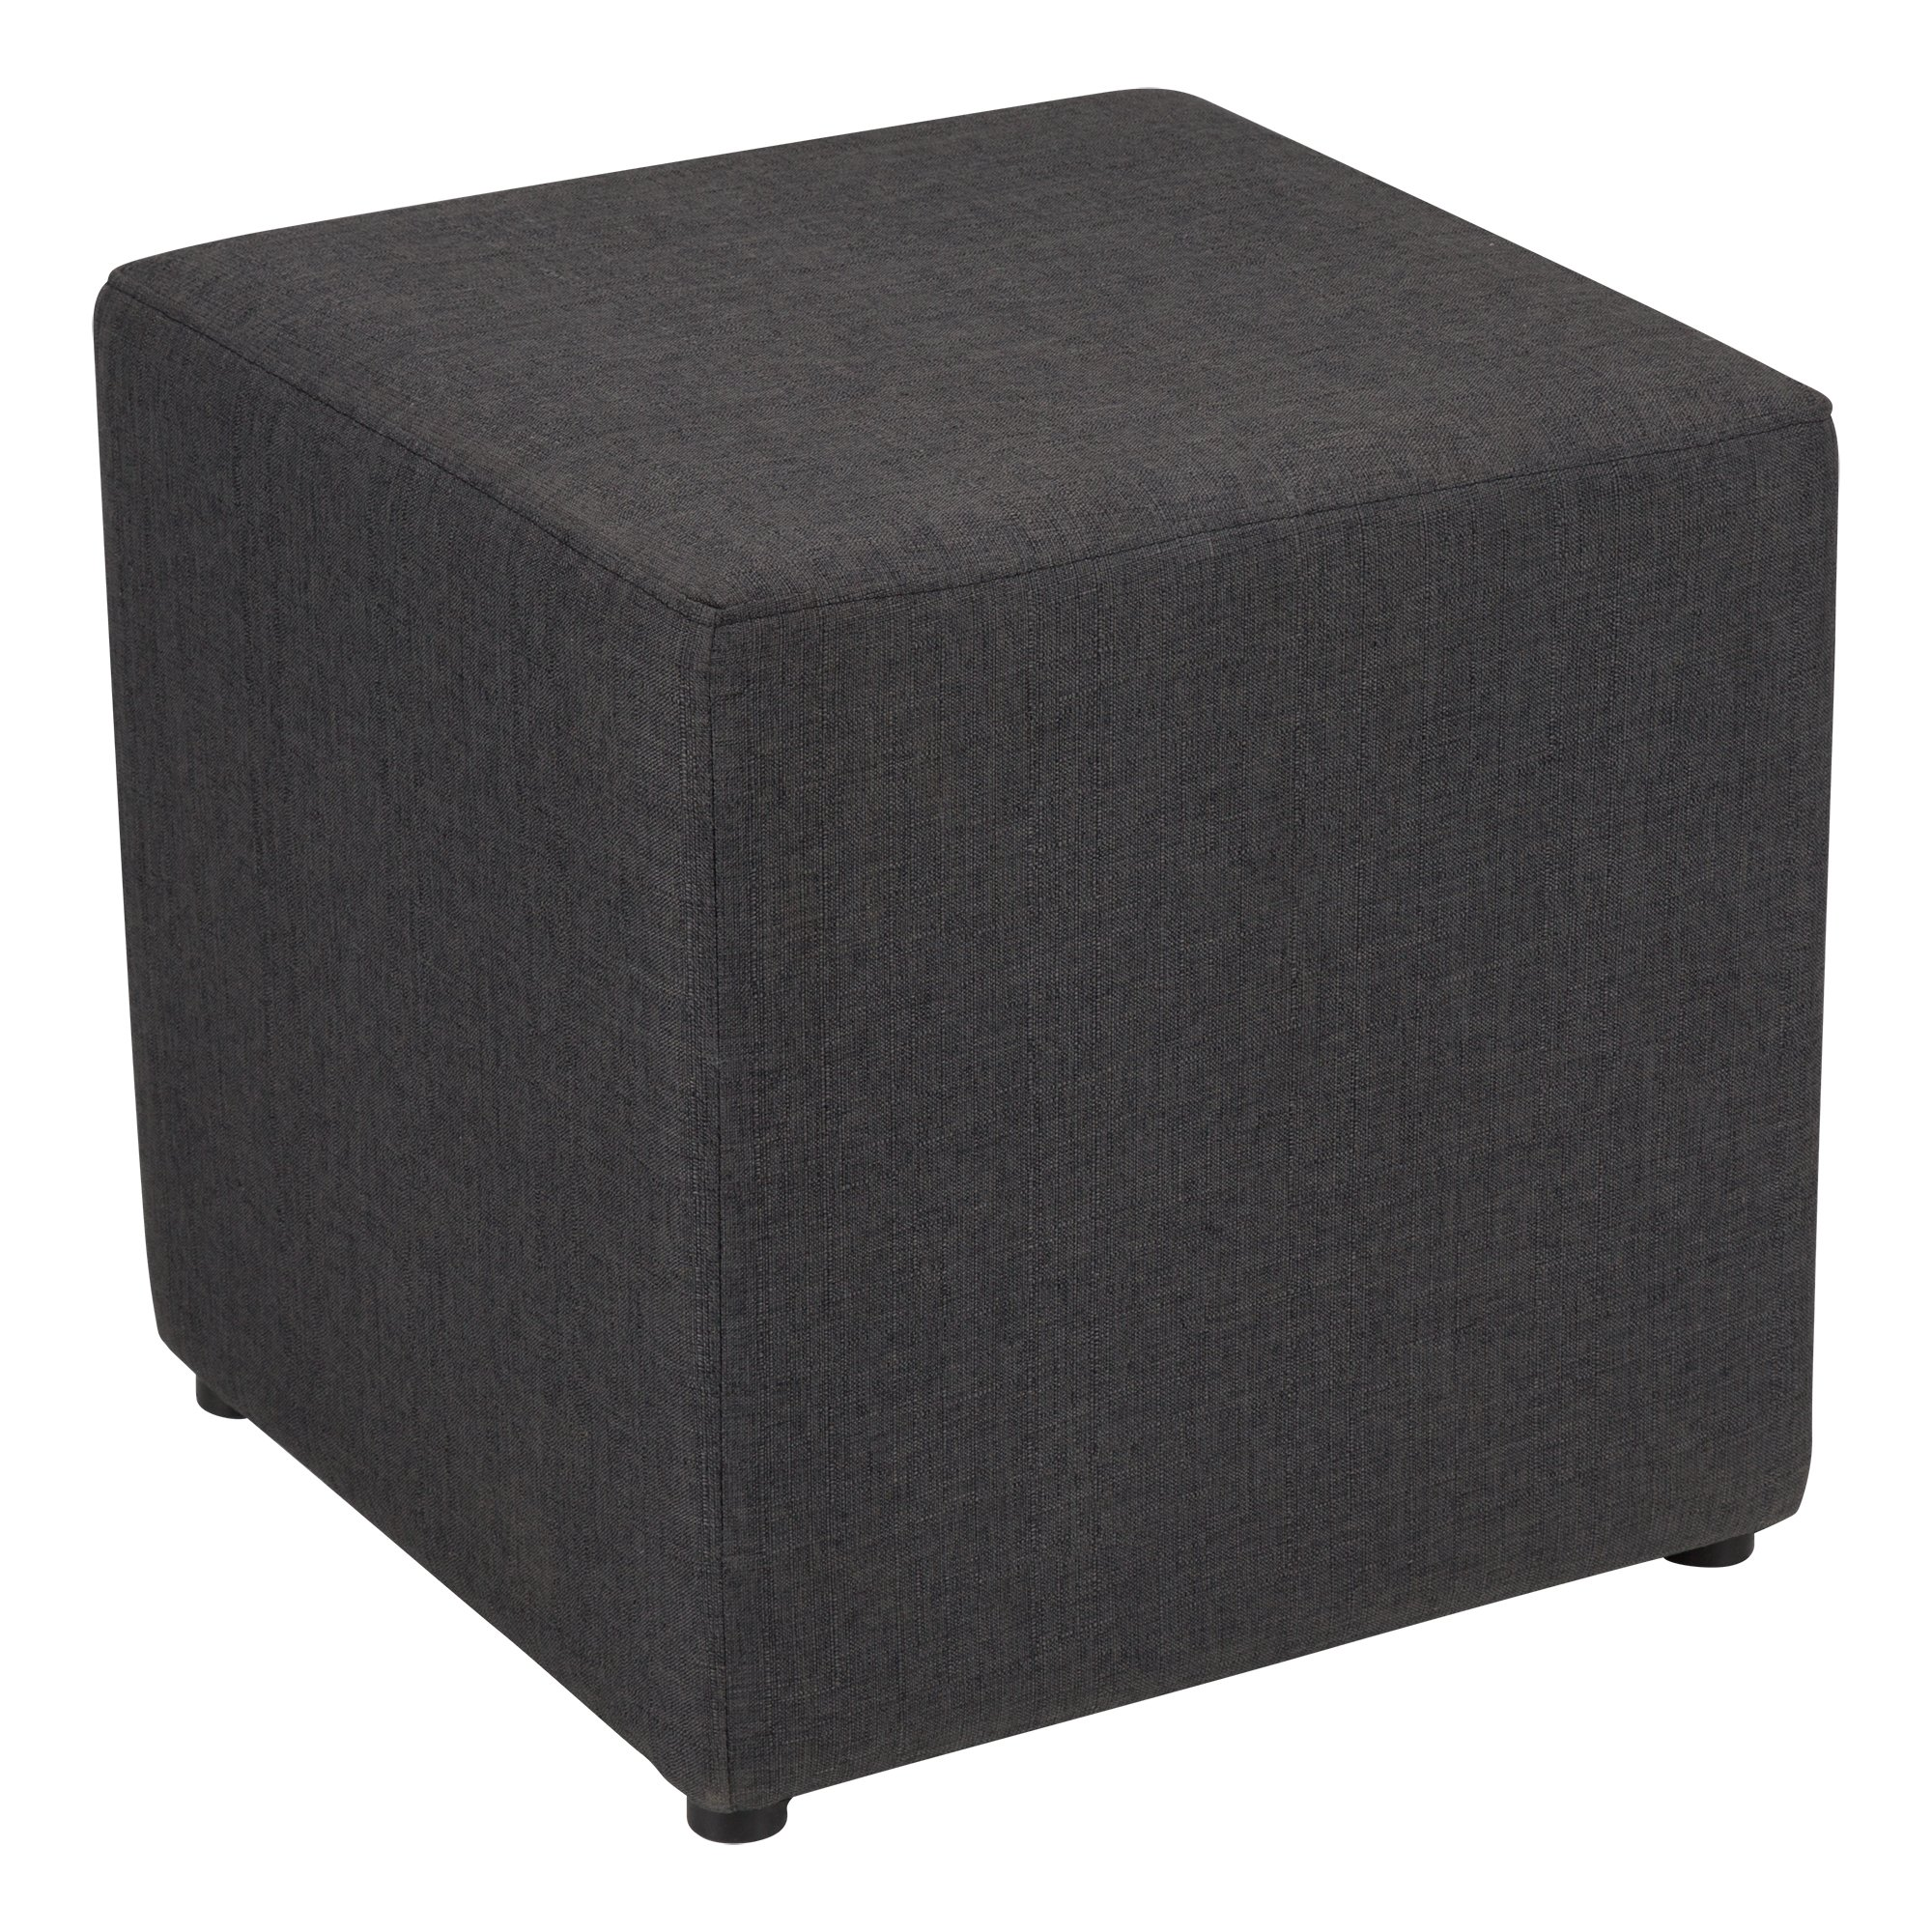 Fat Catalog Cube Storage Stool w/Drawer, Gray, ALT-OUG1001-SO by Fat Catalog (Image #2)